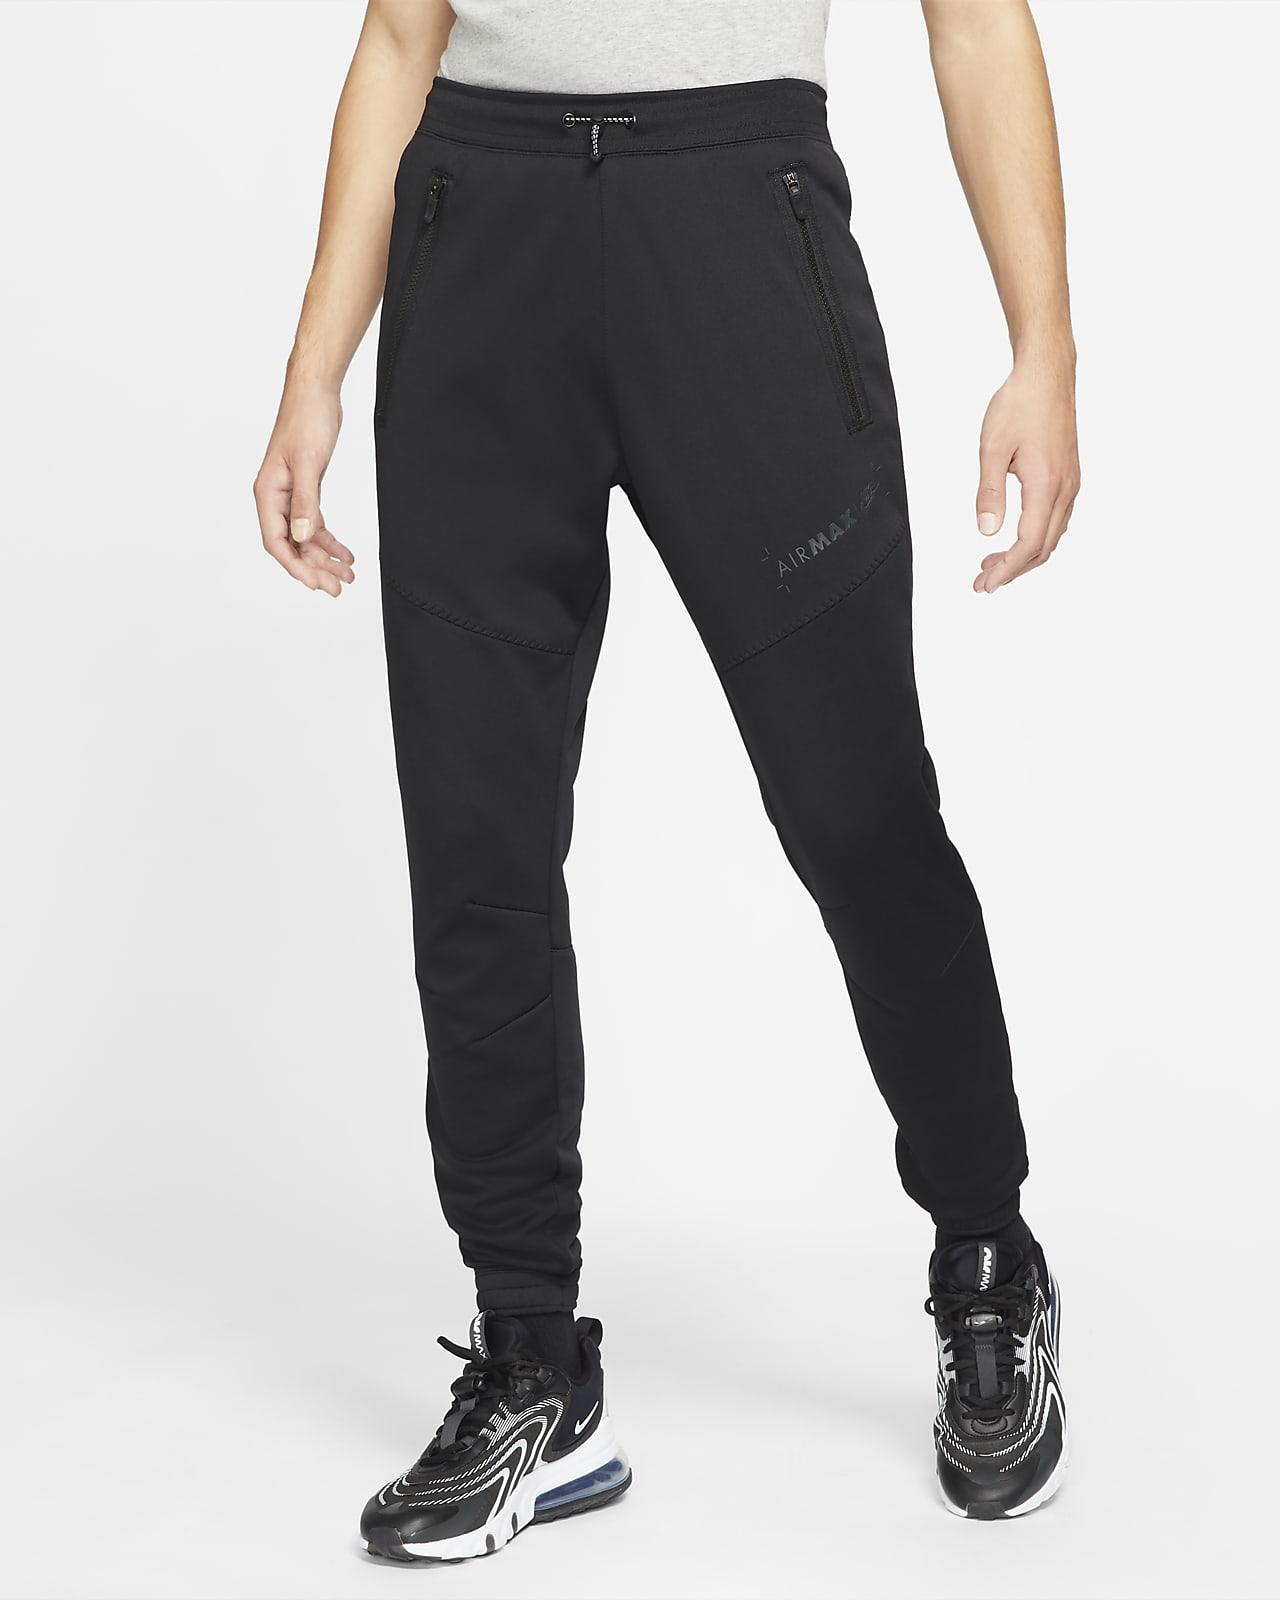 Nike Sportswear Air Max Men's Fleece Trousers. Nike AT